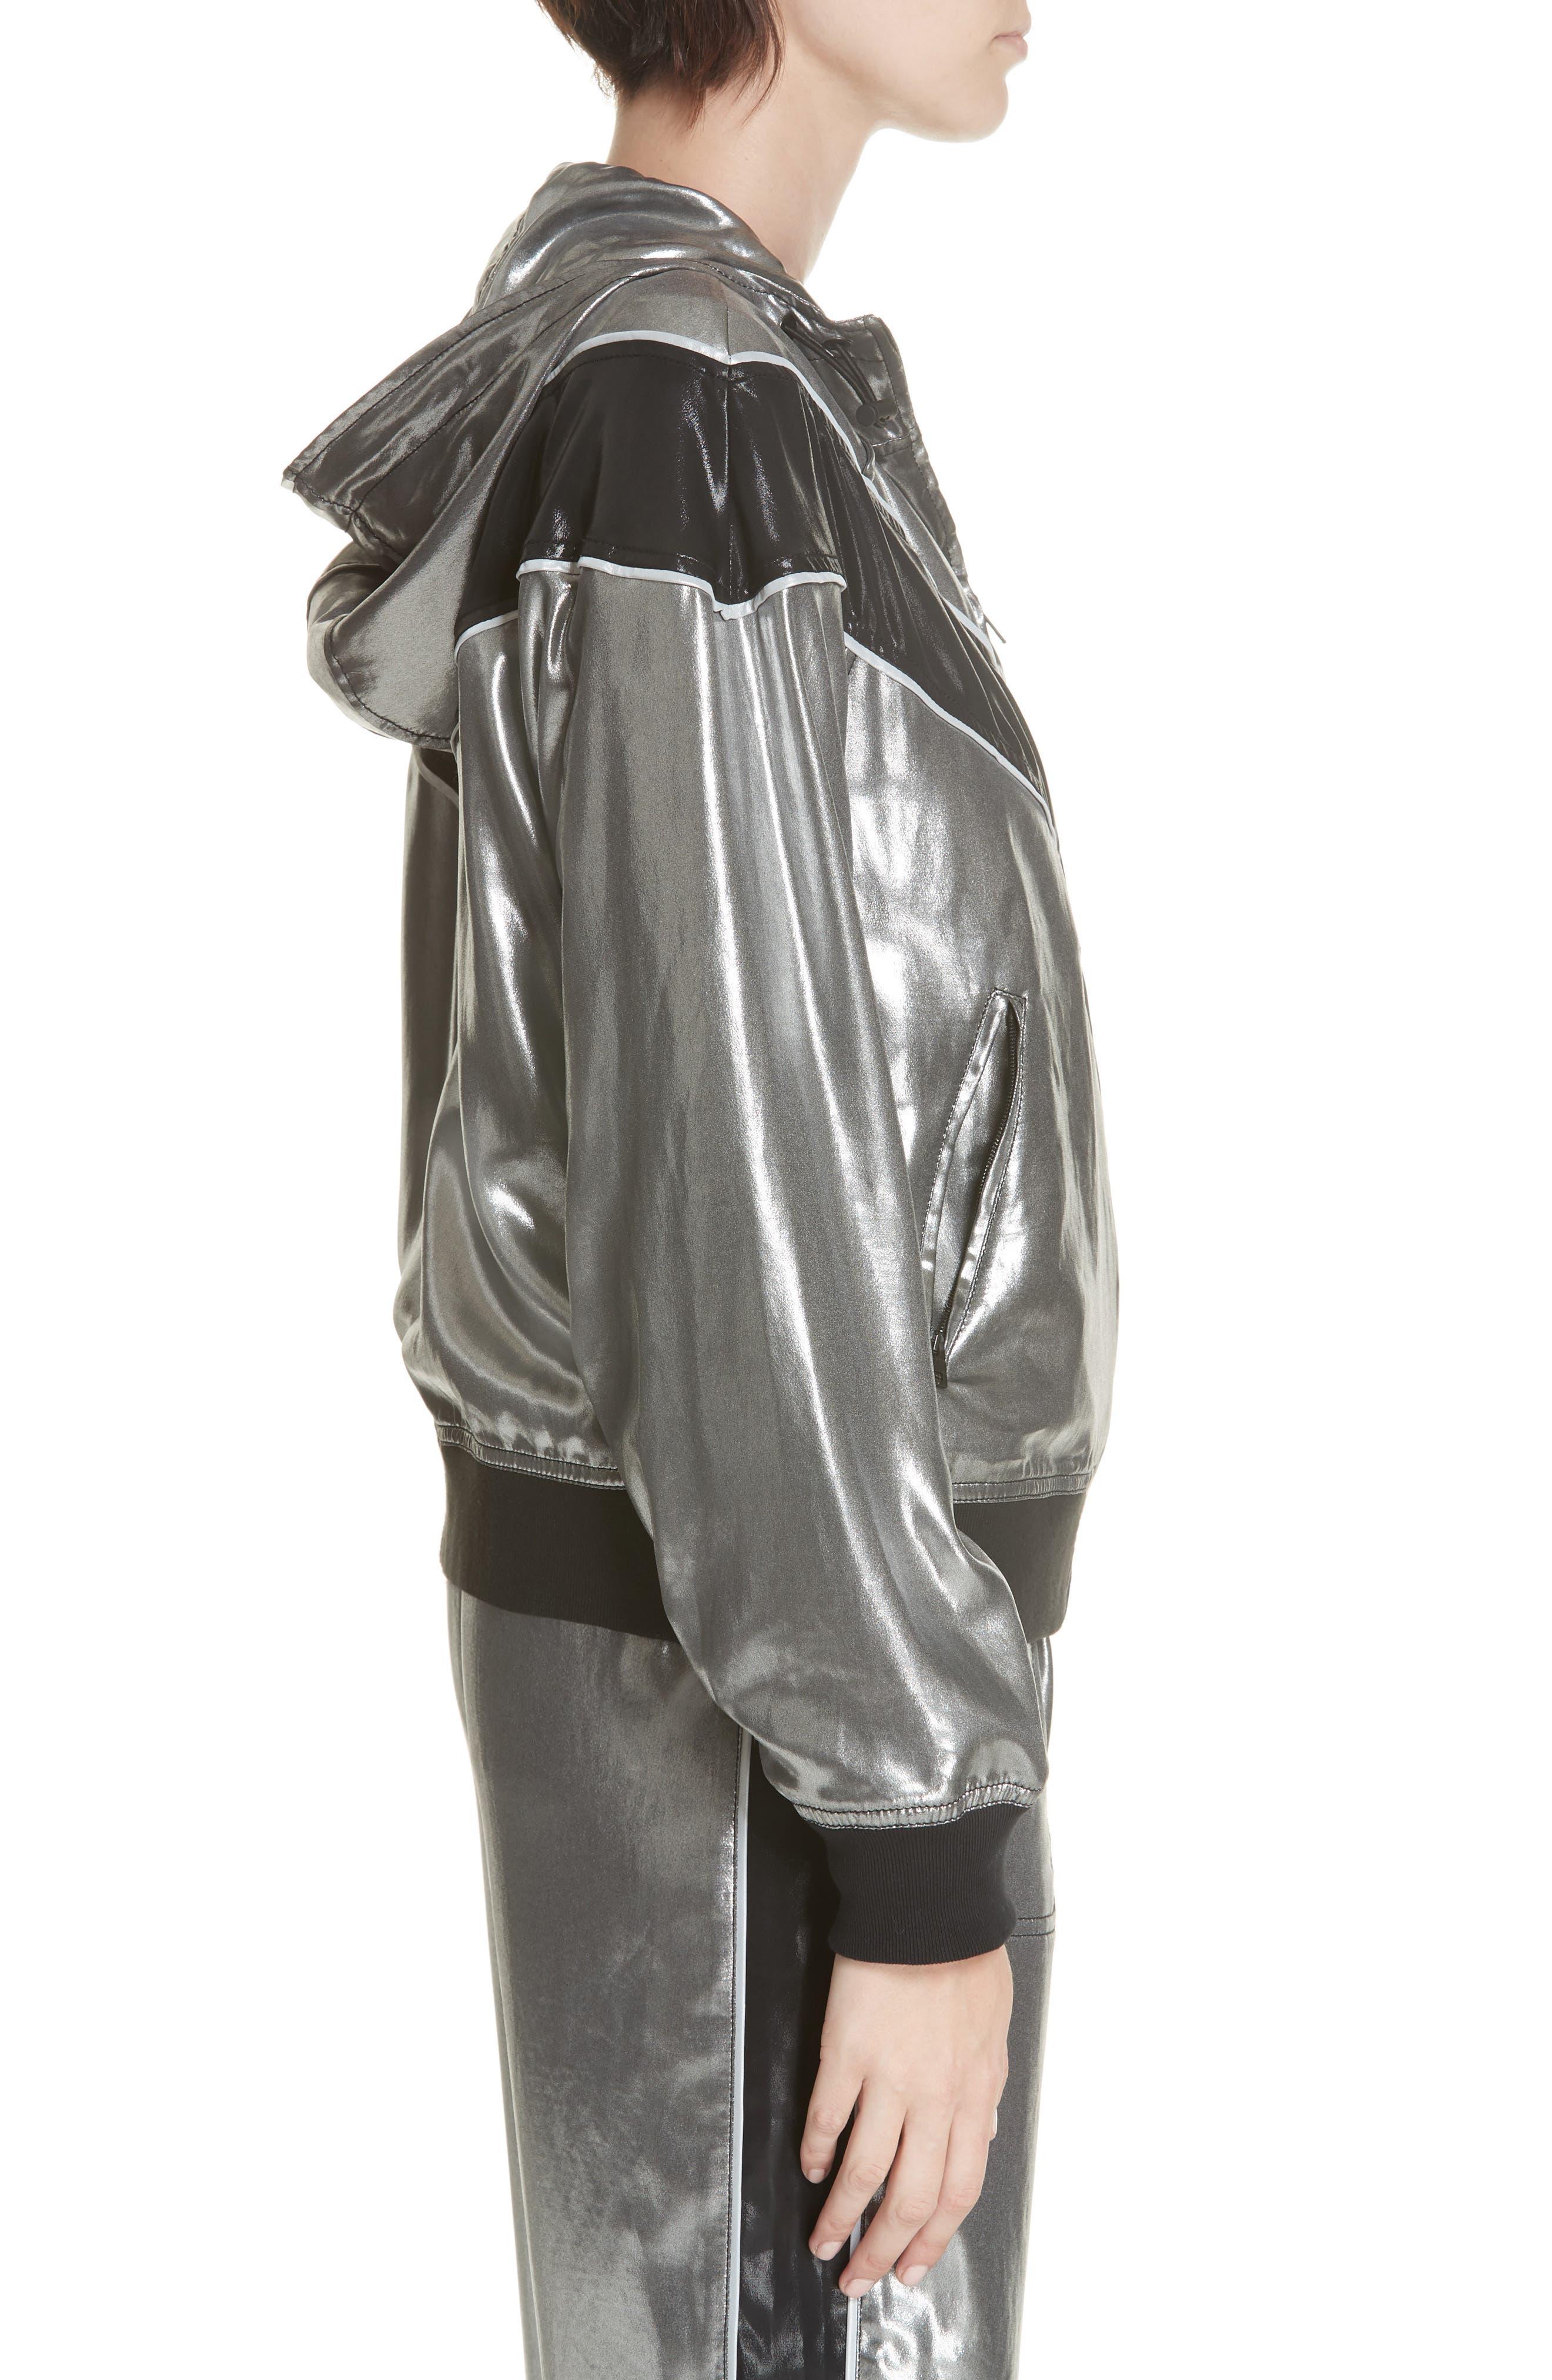 RAG & BONE,                             Sloane Metallic Track Jacket,                             Alternate thumbnail 4, color,                             SILVER/ BLACK